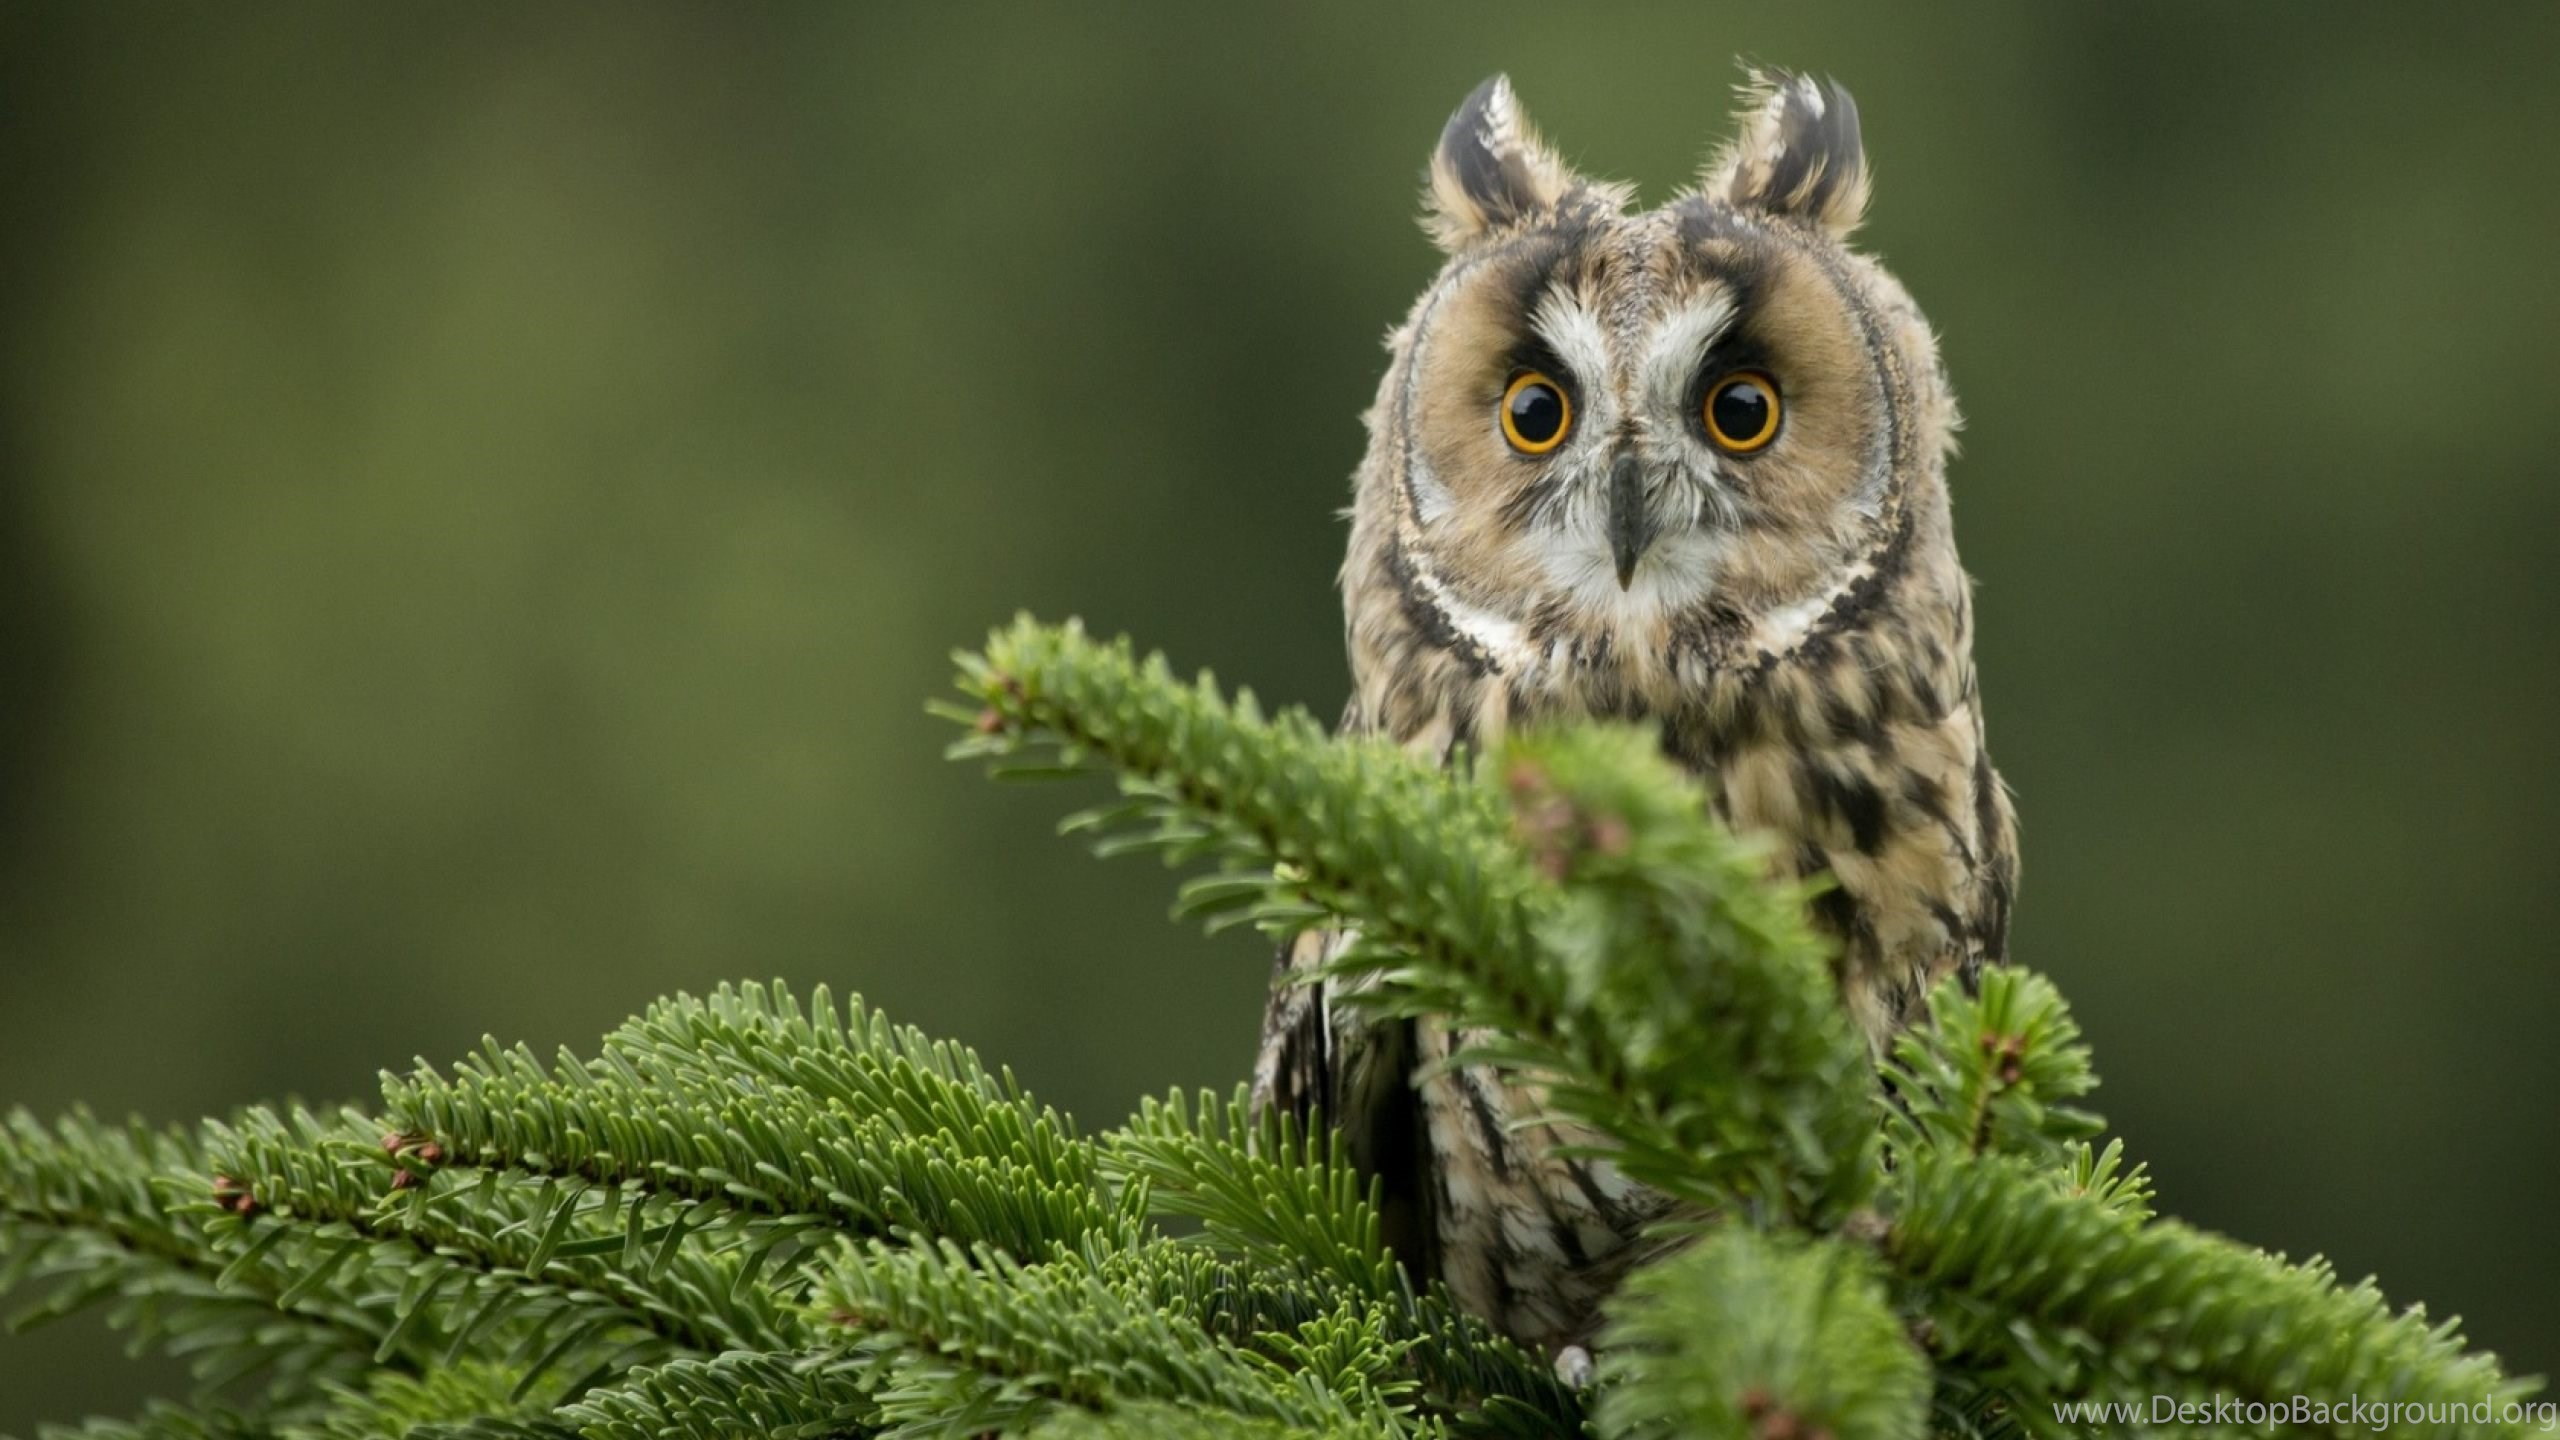 Owl wallpapers for desktop free download of cute owl bird desktop netbook voltagebd Images